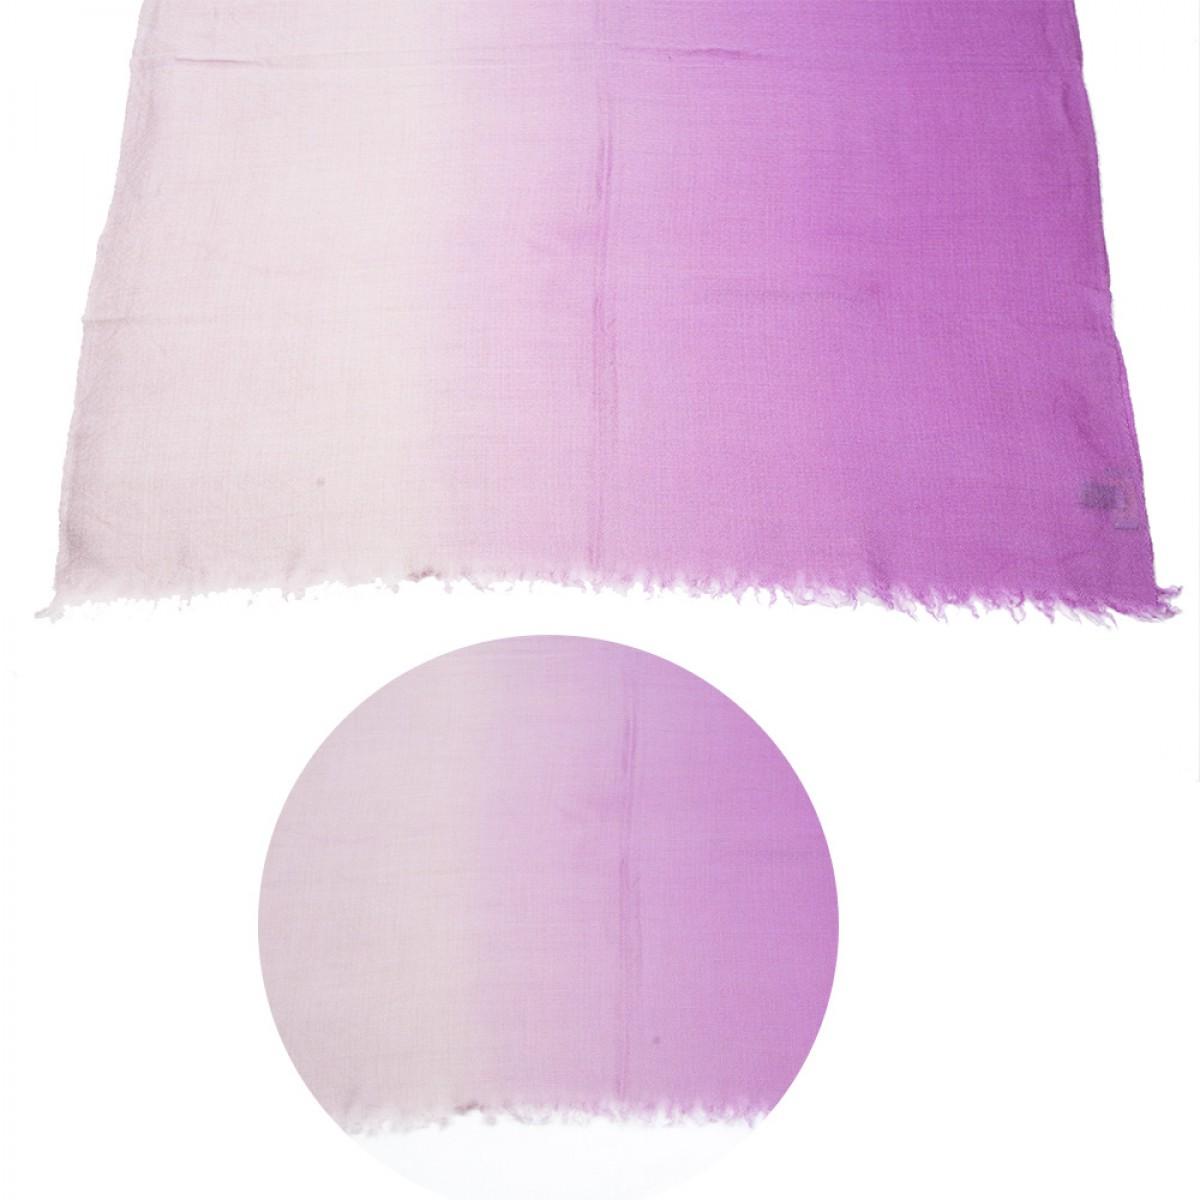 Ombre Pashmina Stole - Purple